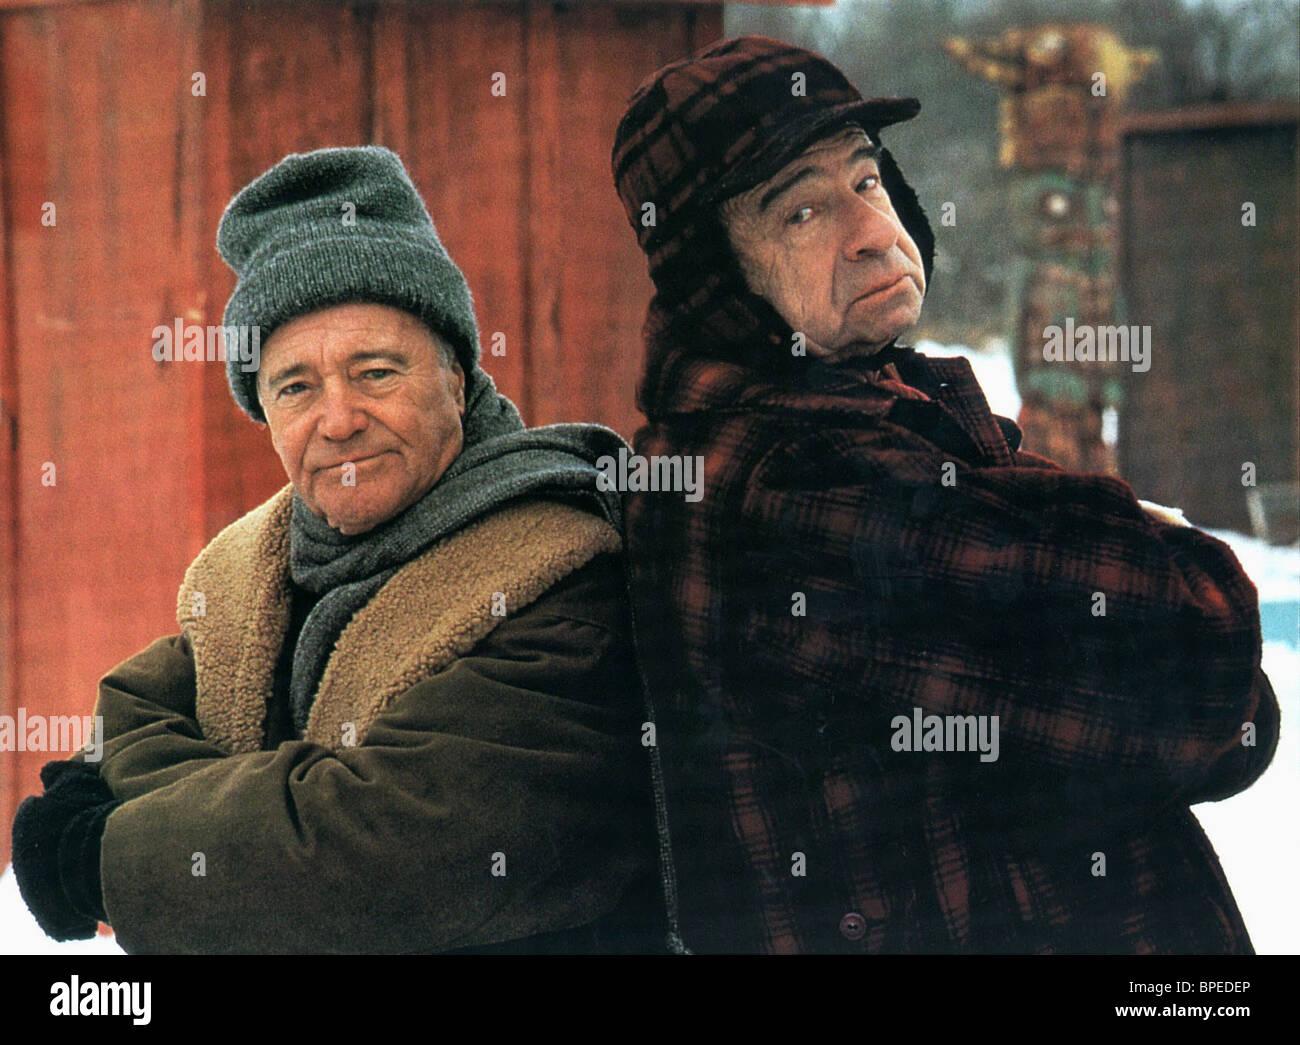 JACK LEMMON, Walter Matthau, hombres gruñones, 1993 Foto de stock